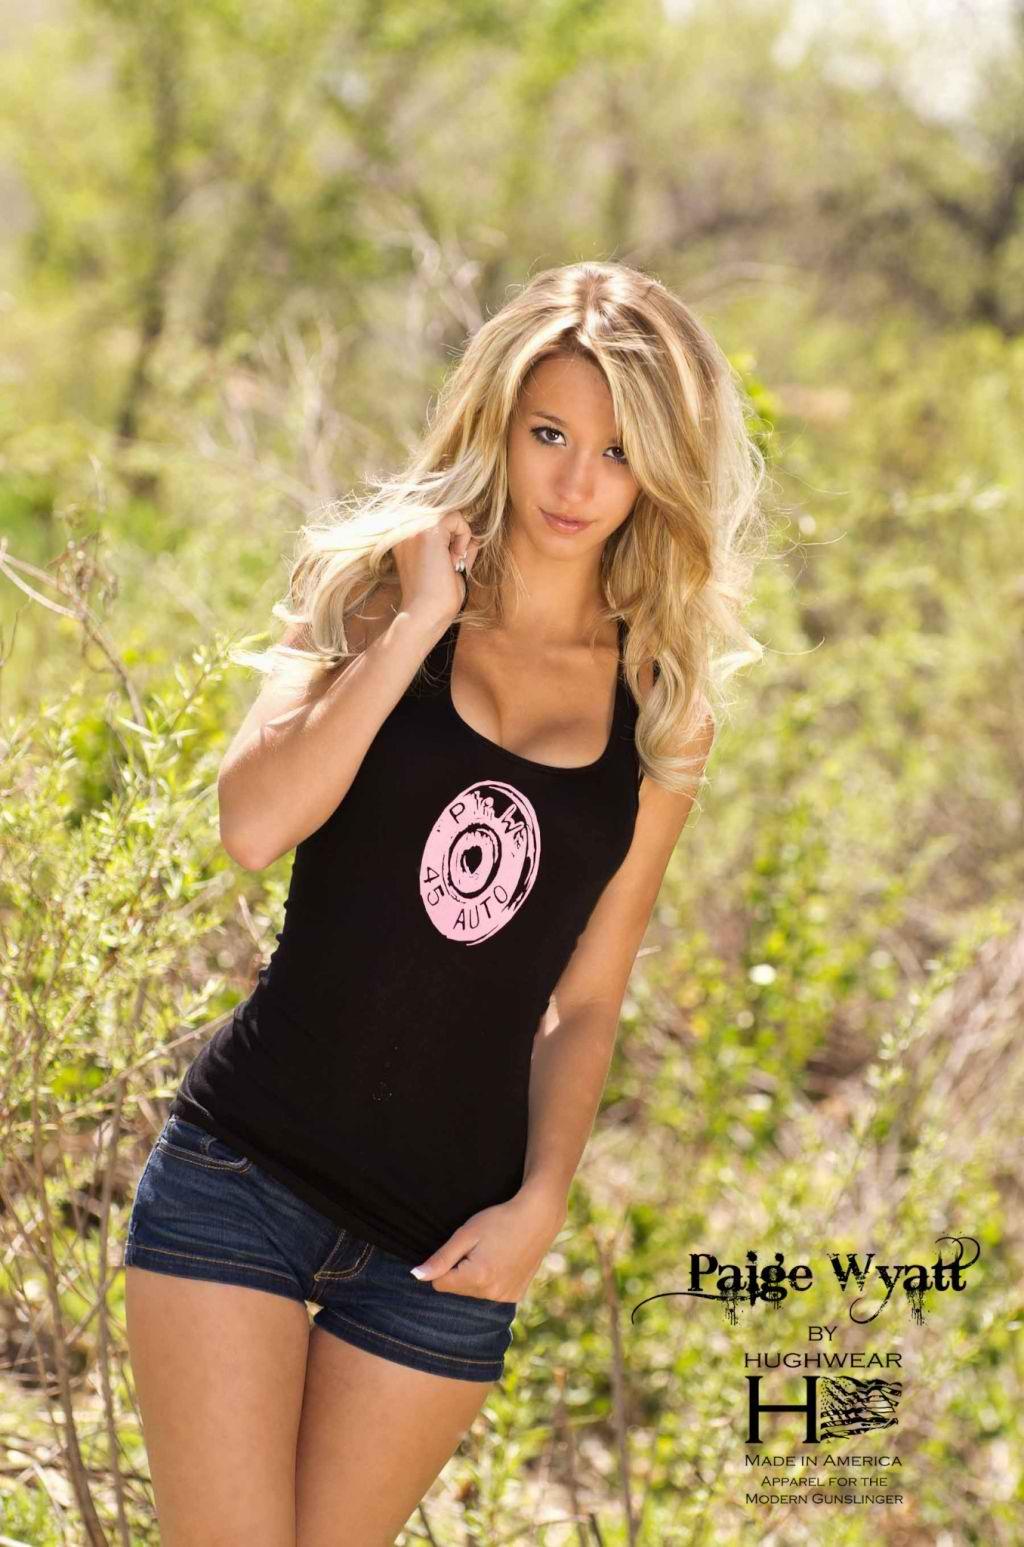 Paige Wyatt American Guns 19 Gotceleb